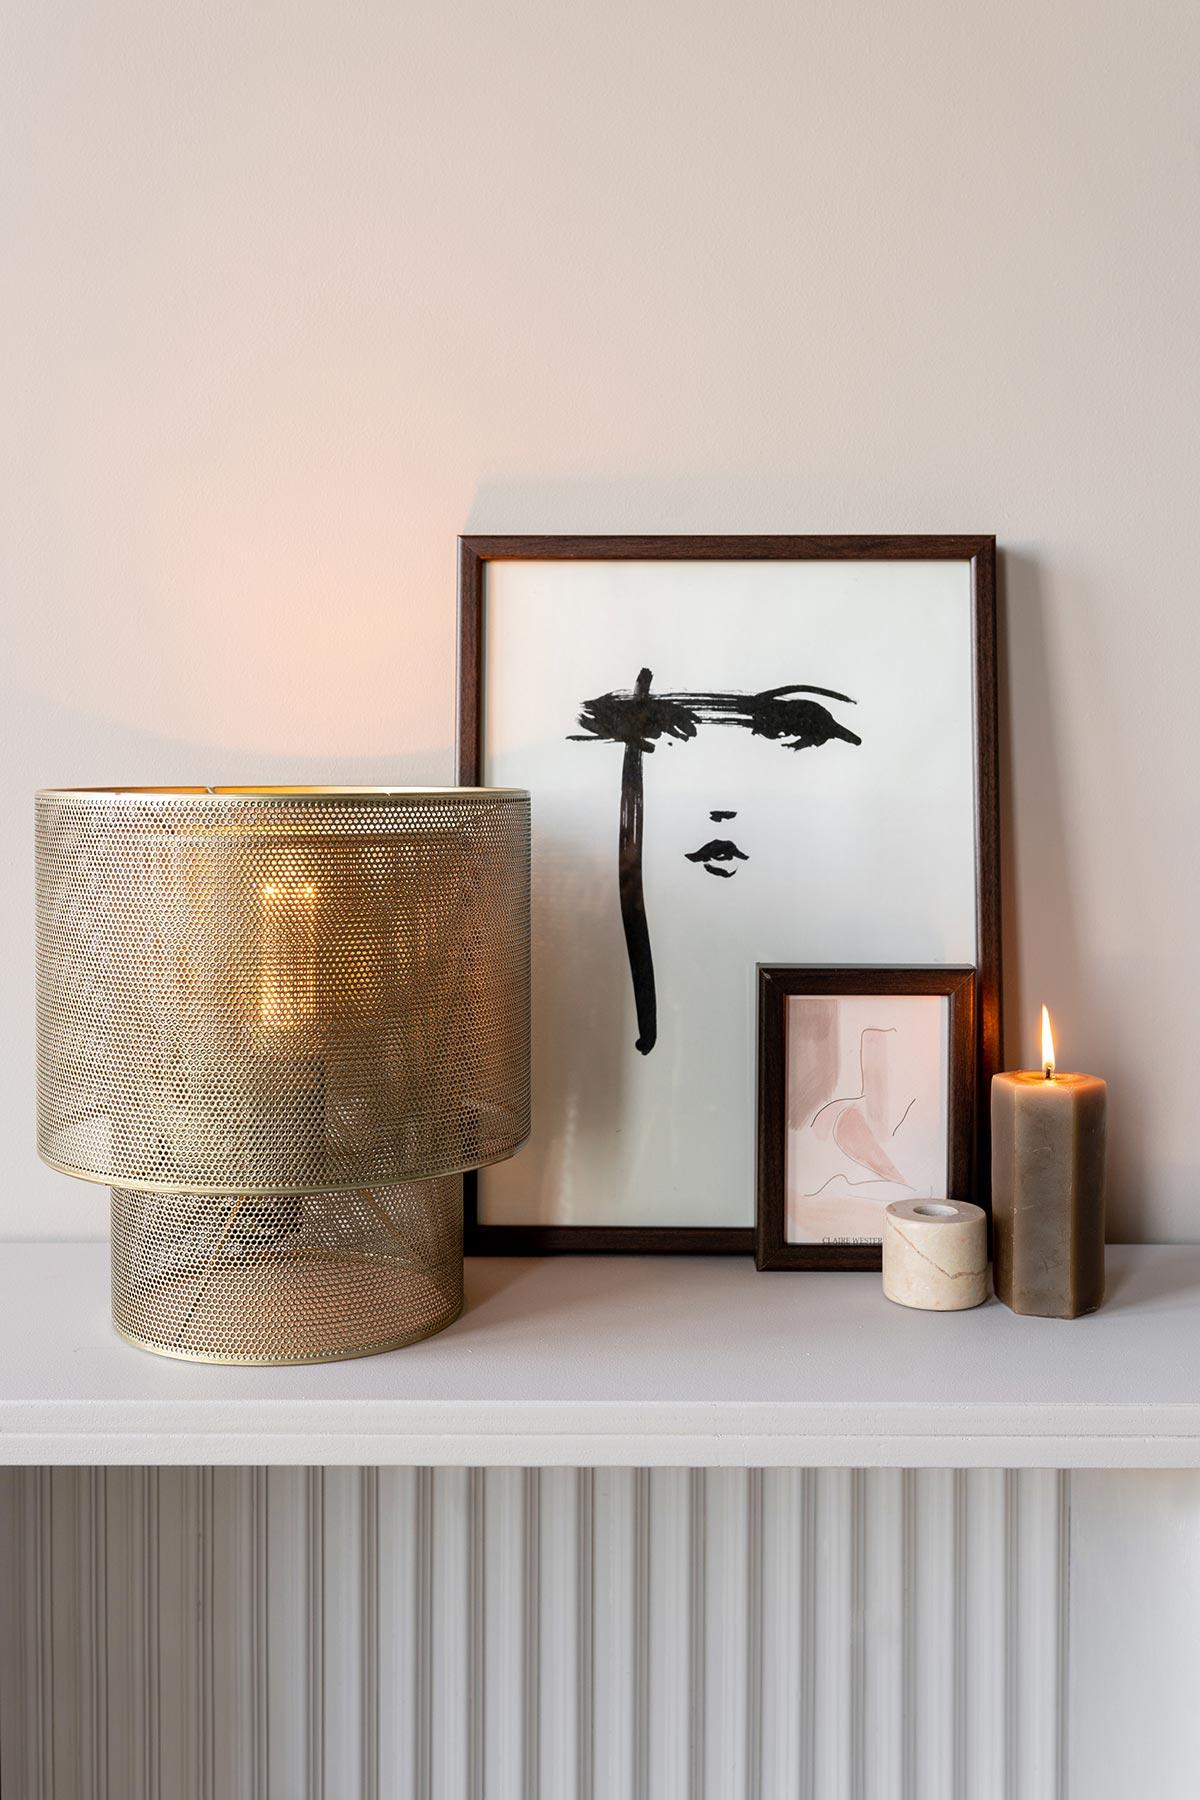 Messing tafellamp Ellis karwei - Tanja van Hoogdalem